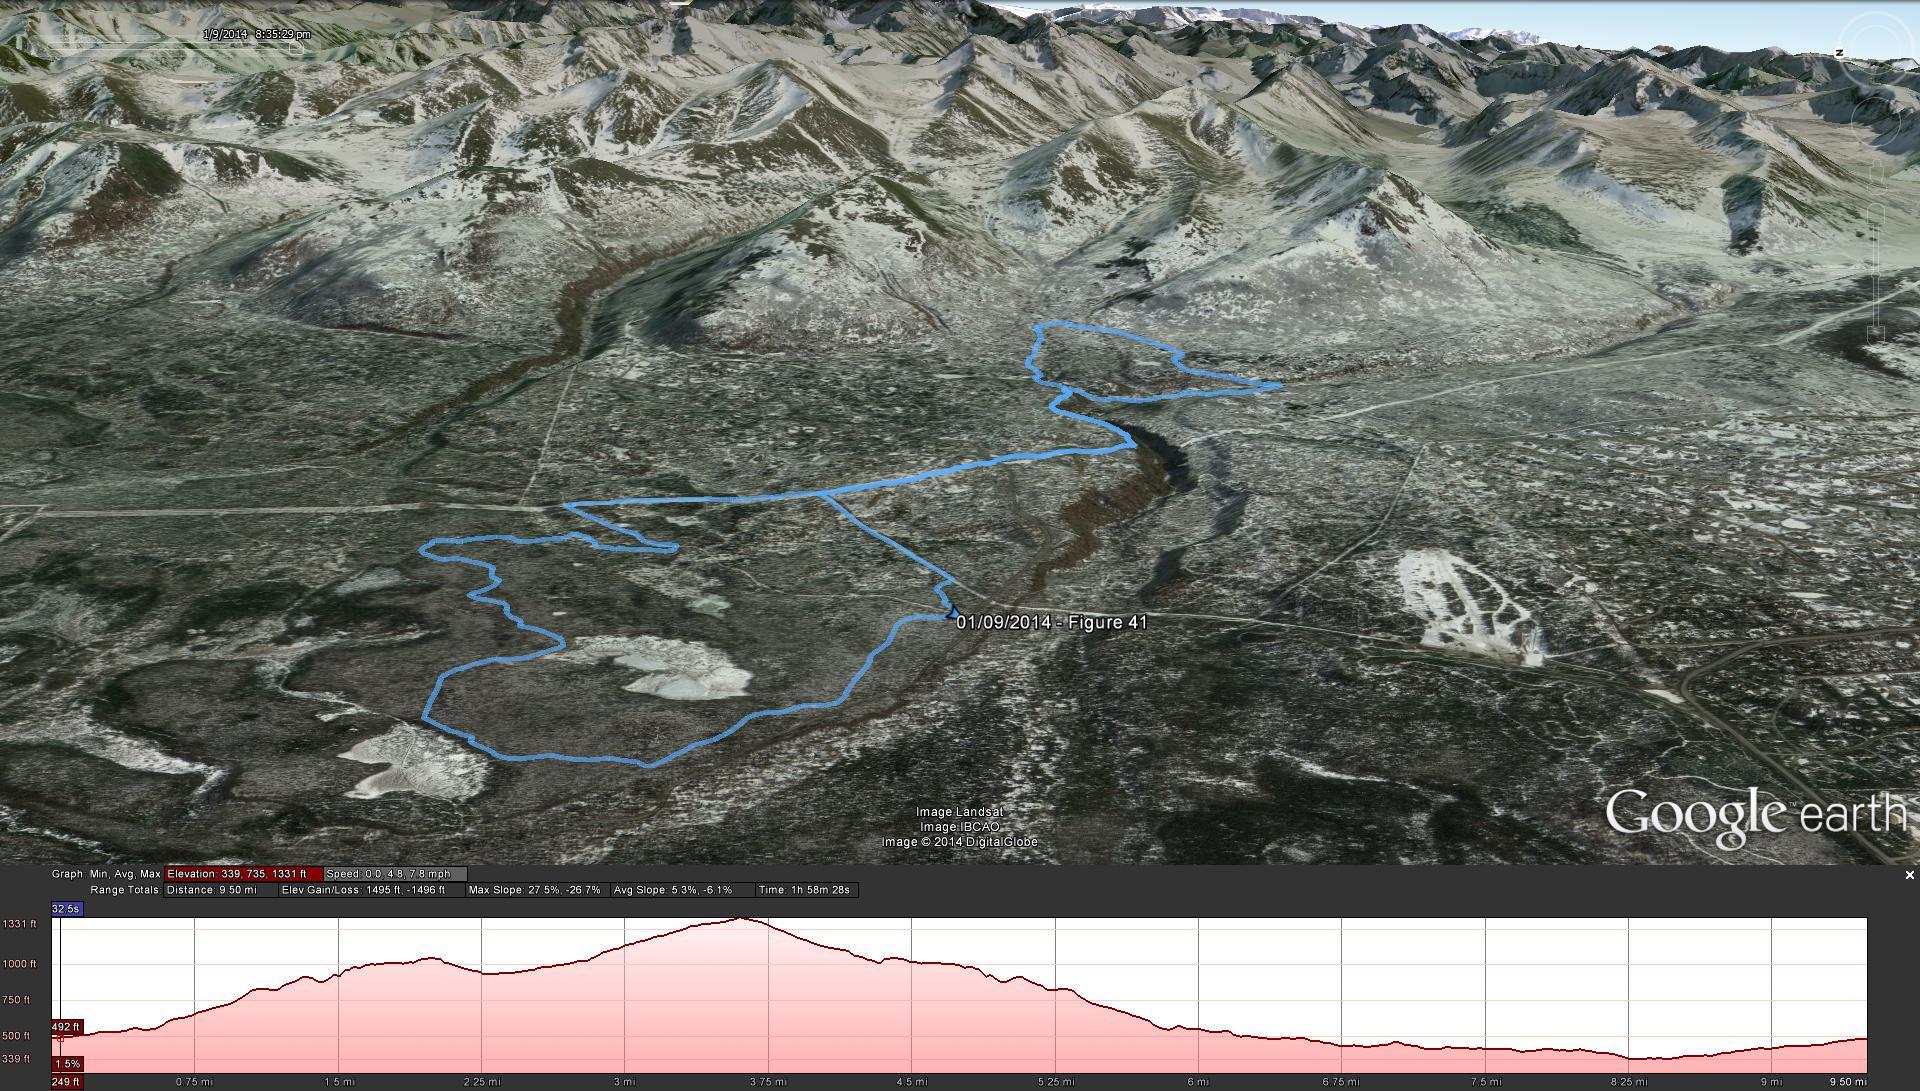 Figure 41 Route - 1/9/2014